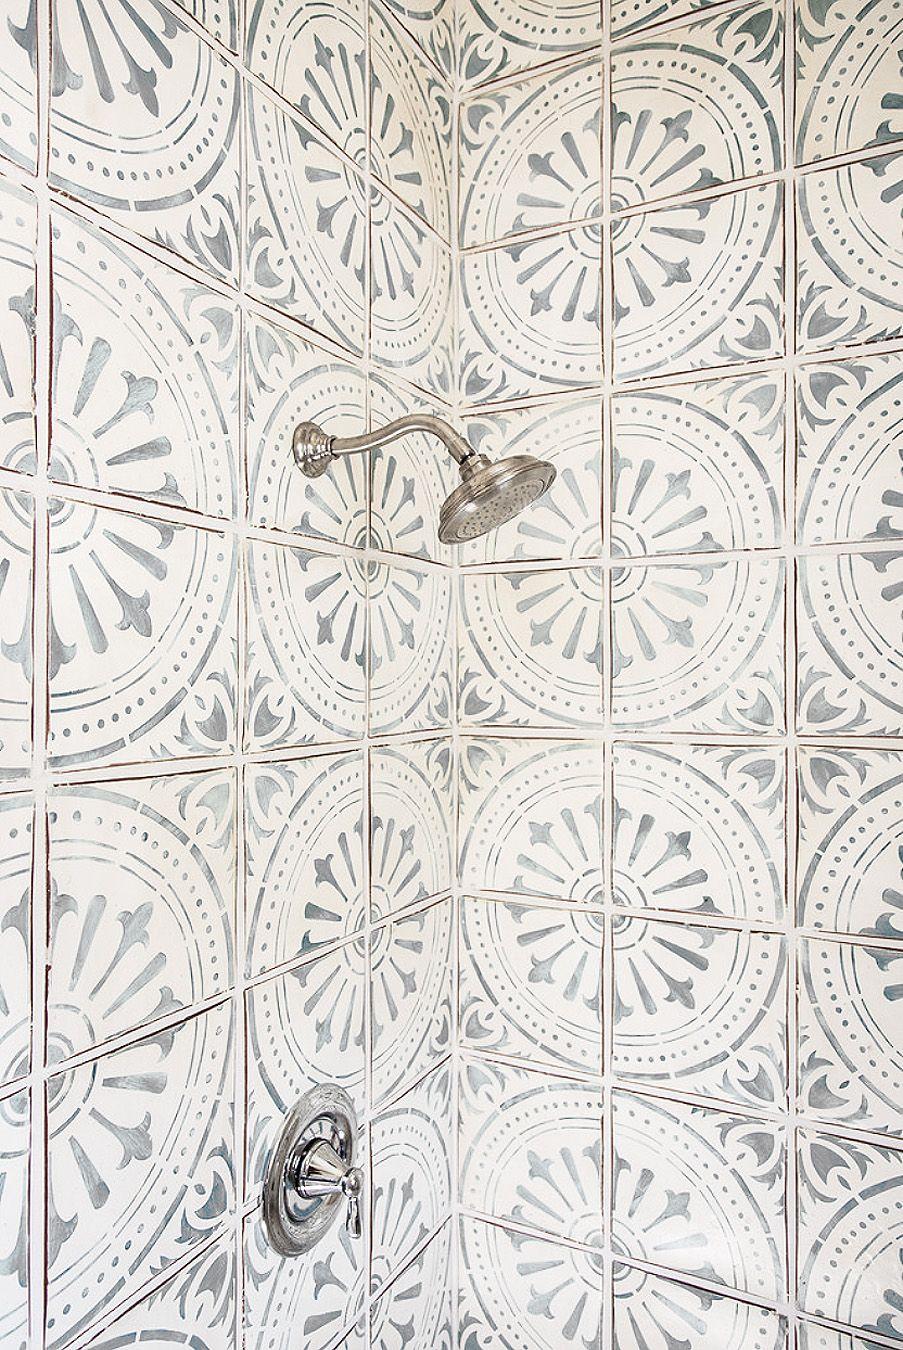 Loving Patterned Cement Tile | Patterns, Tile patterns and Hardware